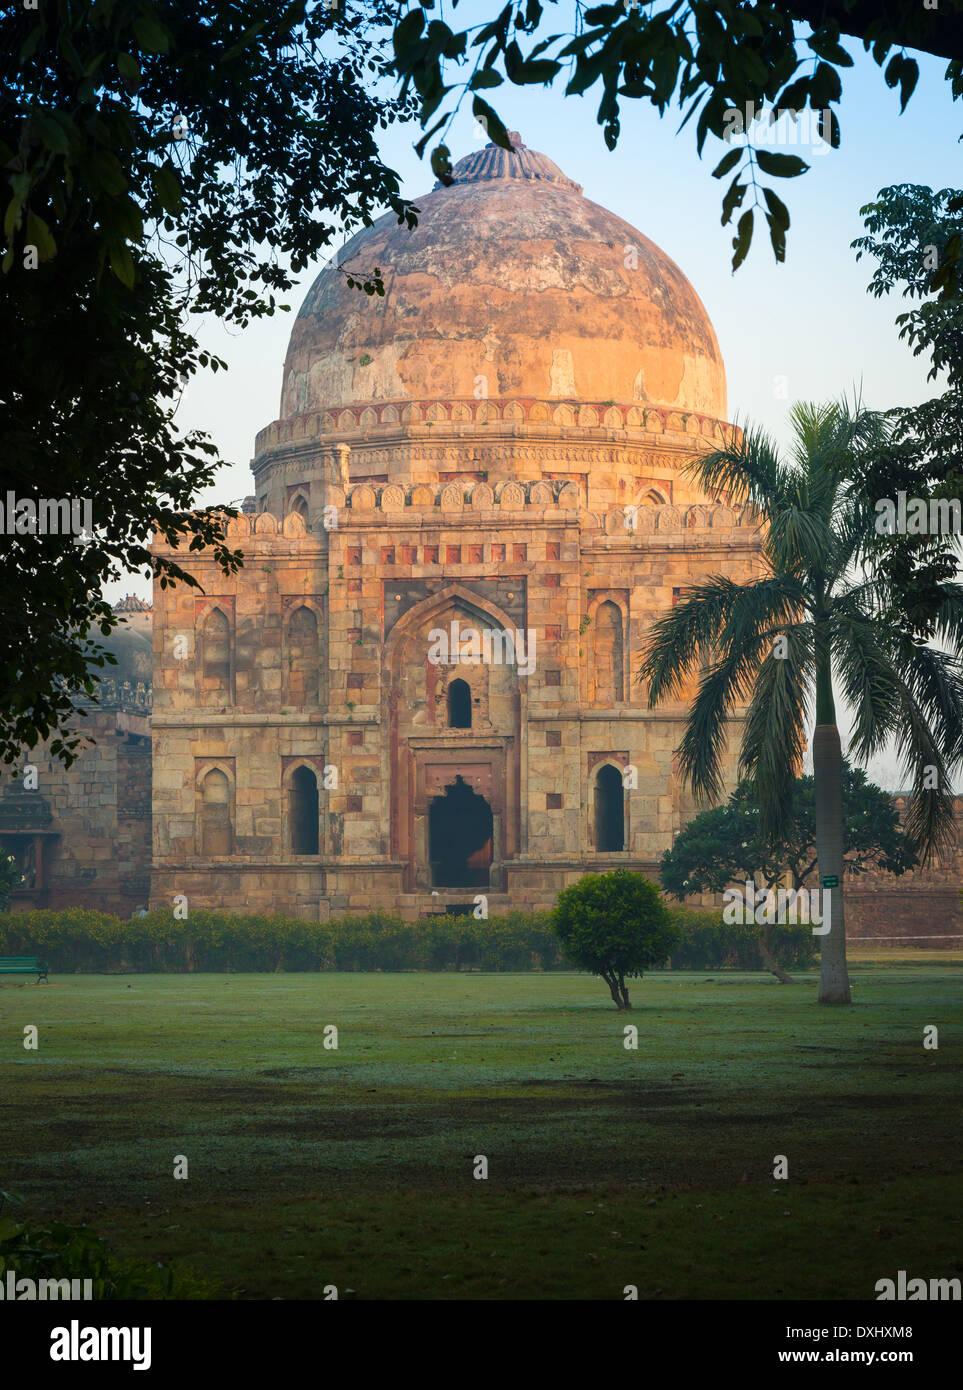 Bara Gumbad in Lodi Gardens, New Delhi, India - Stock Image